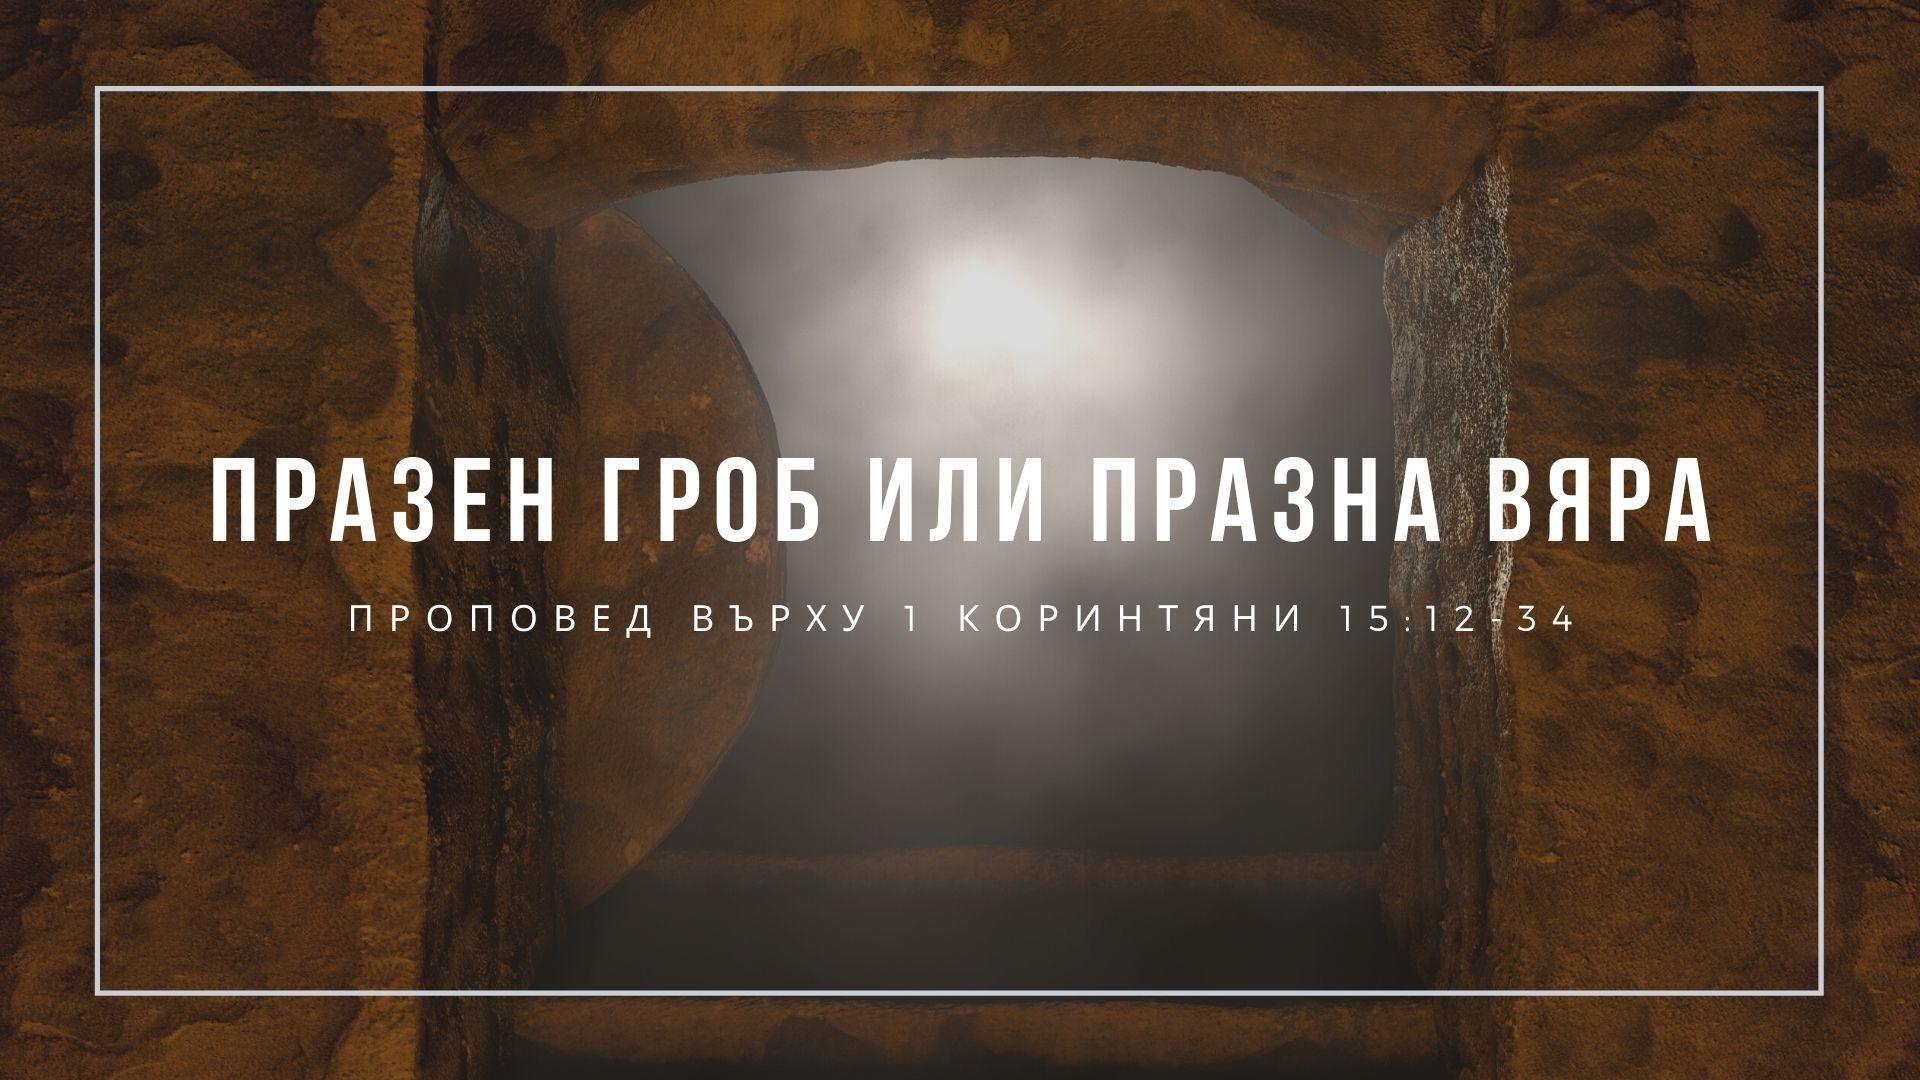 sermon-images